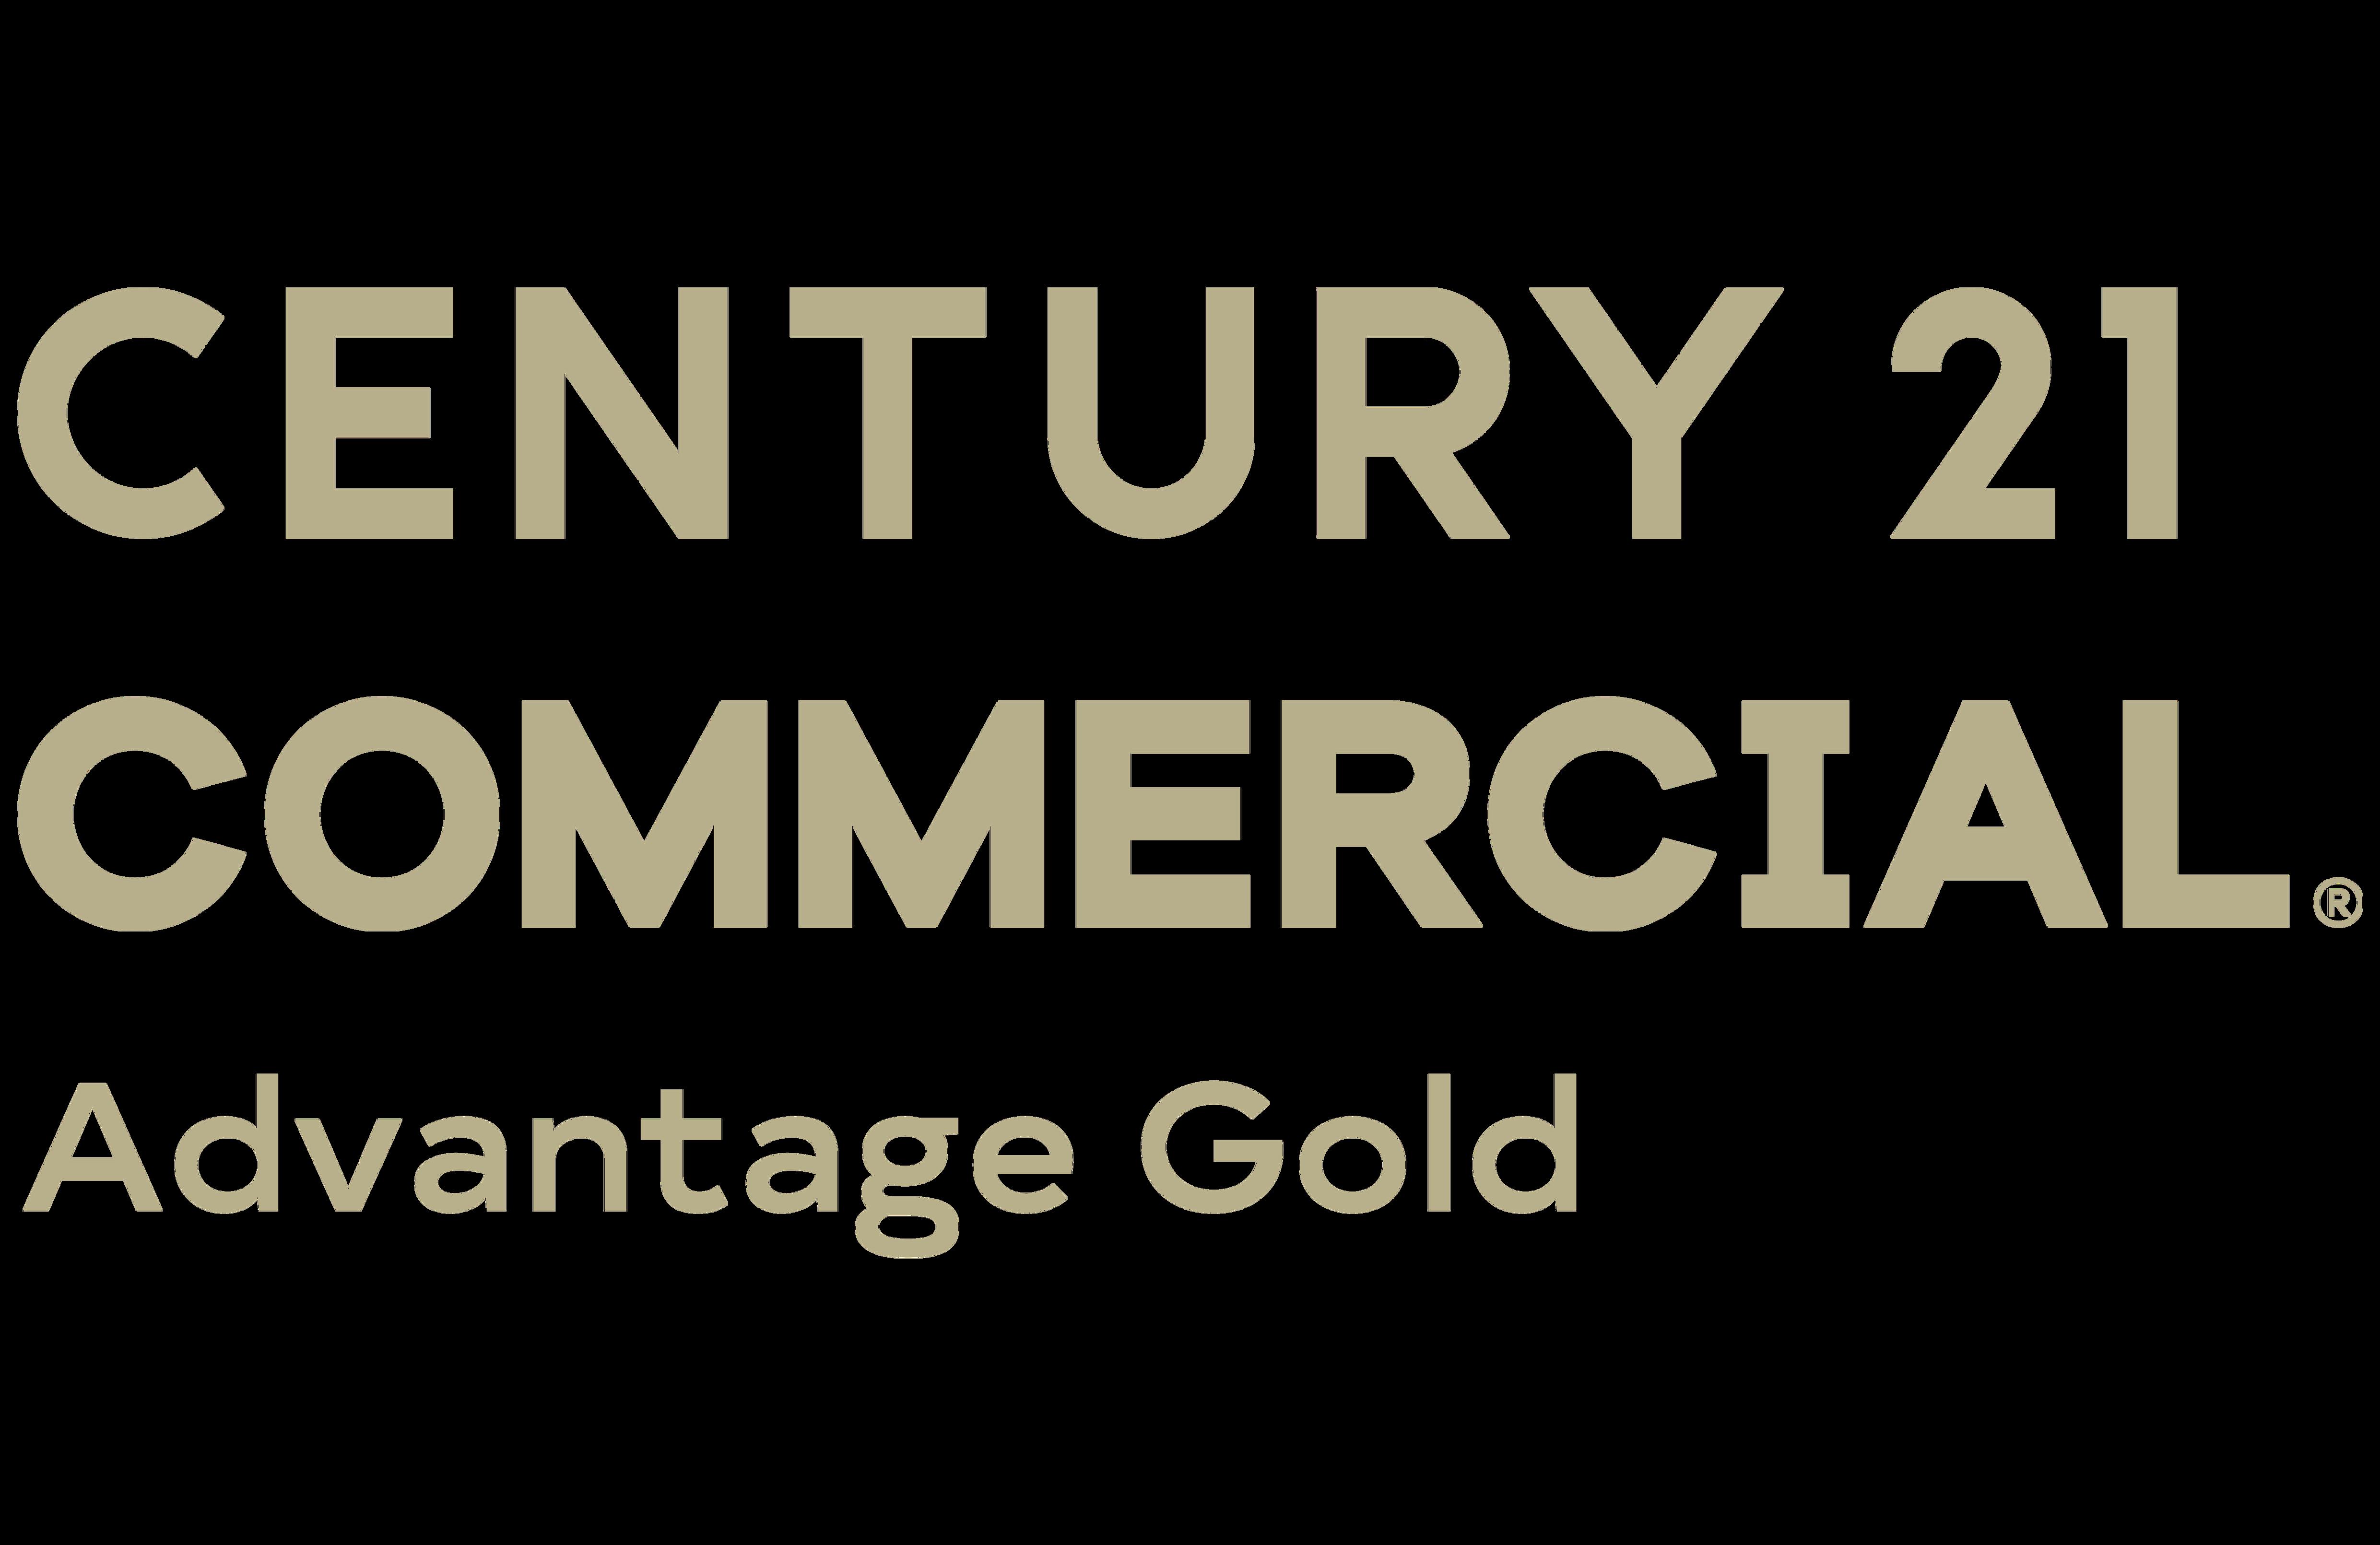 William Lublin of CENTURY 21 Advantage Gold logo